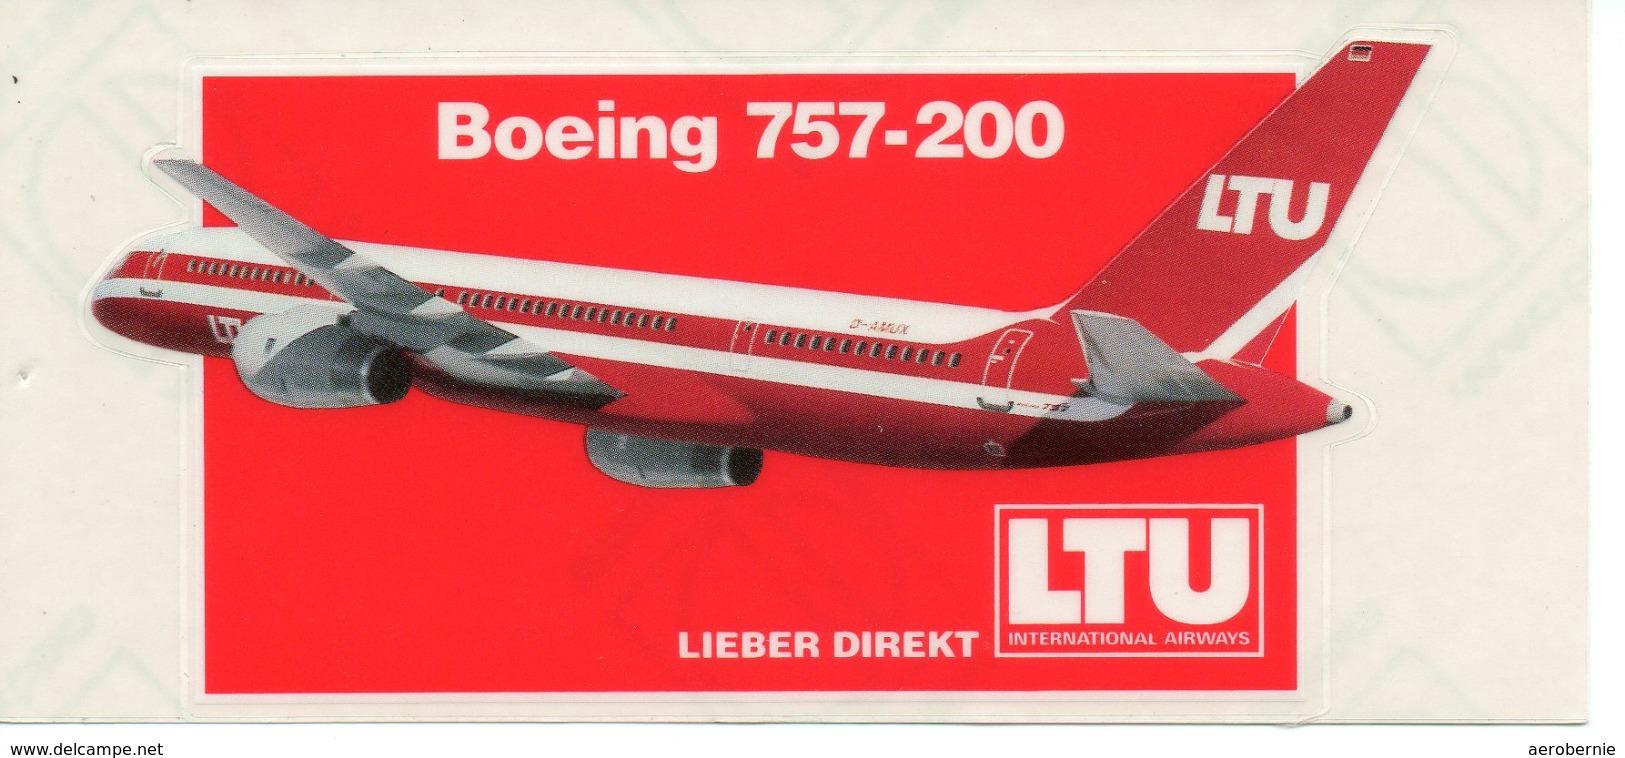 Aufkleber LTU - Boeing 757 - Aufkleber